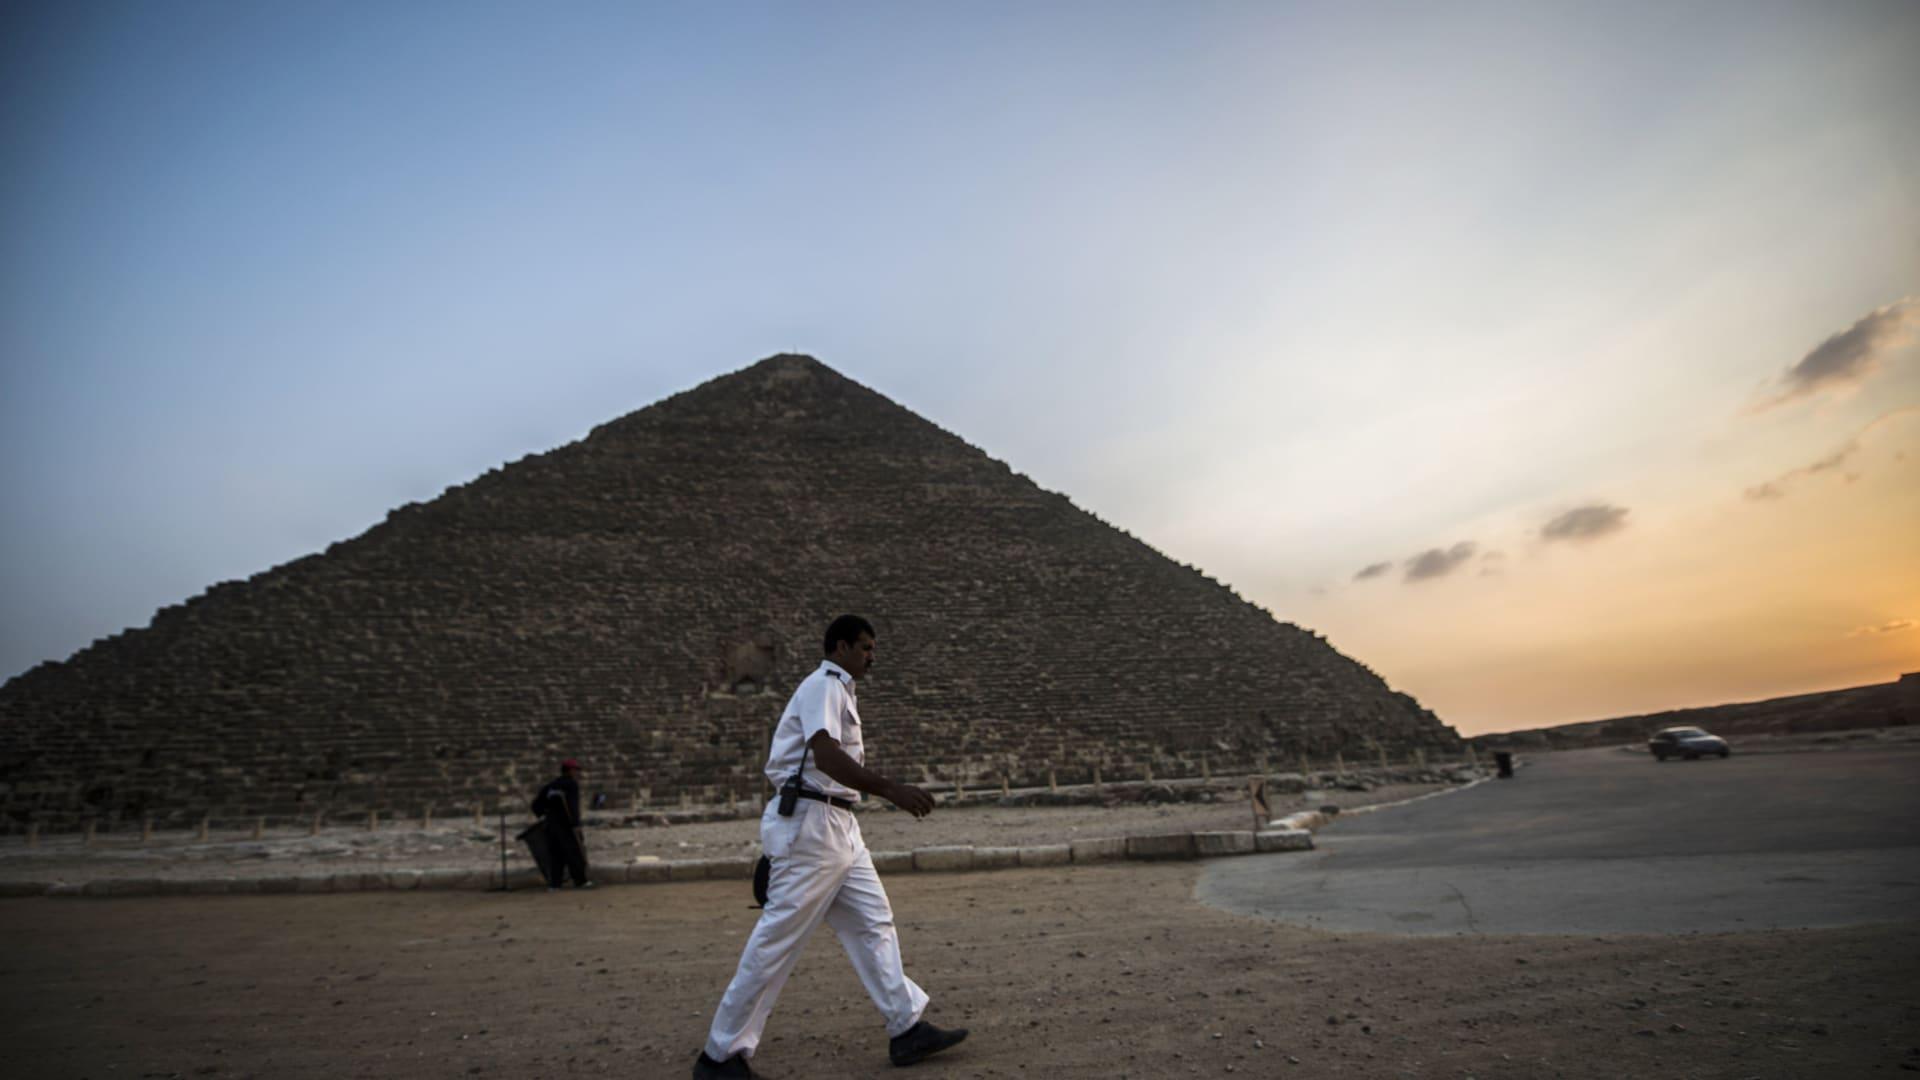 اكتشاف مومياء عمرها 3 آلاف عام في مصر